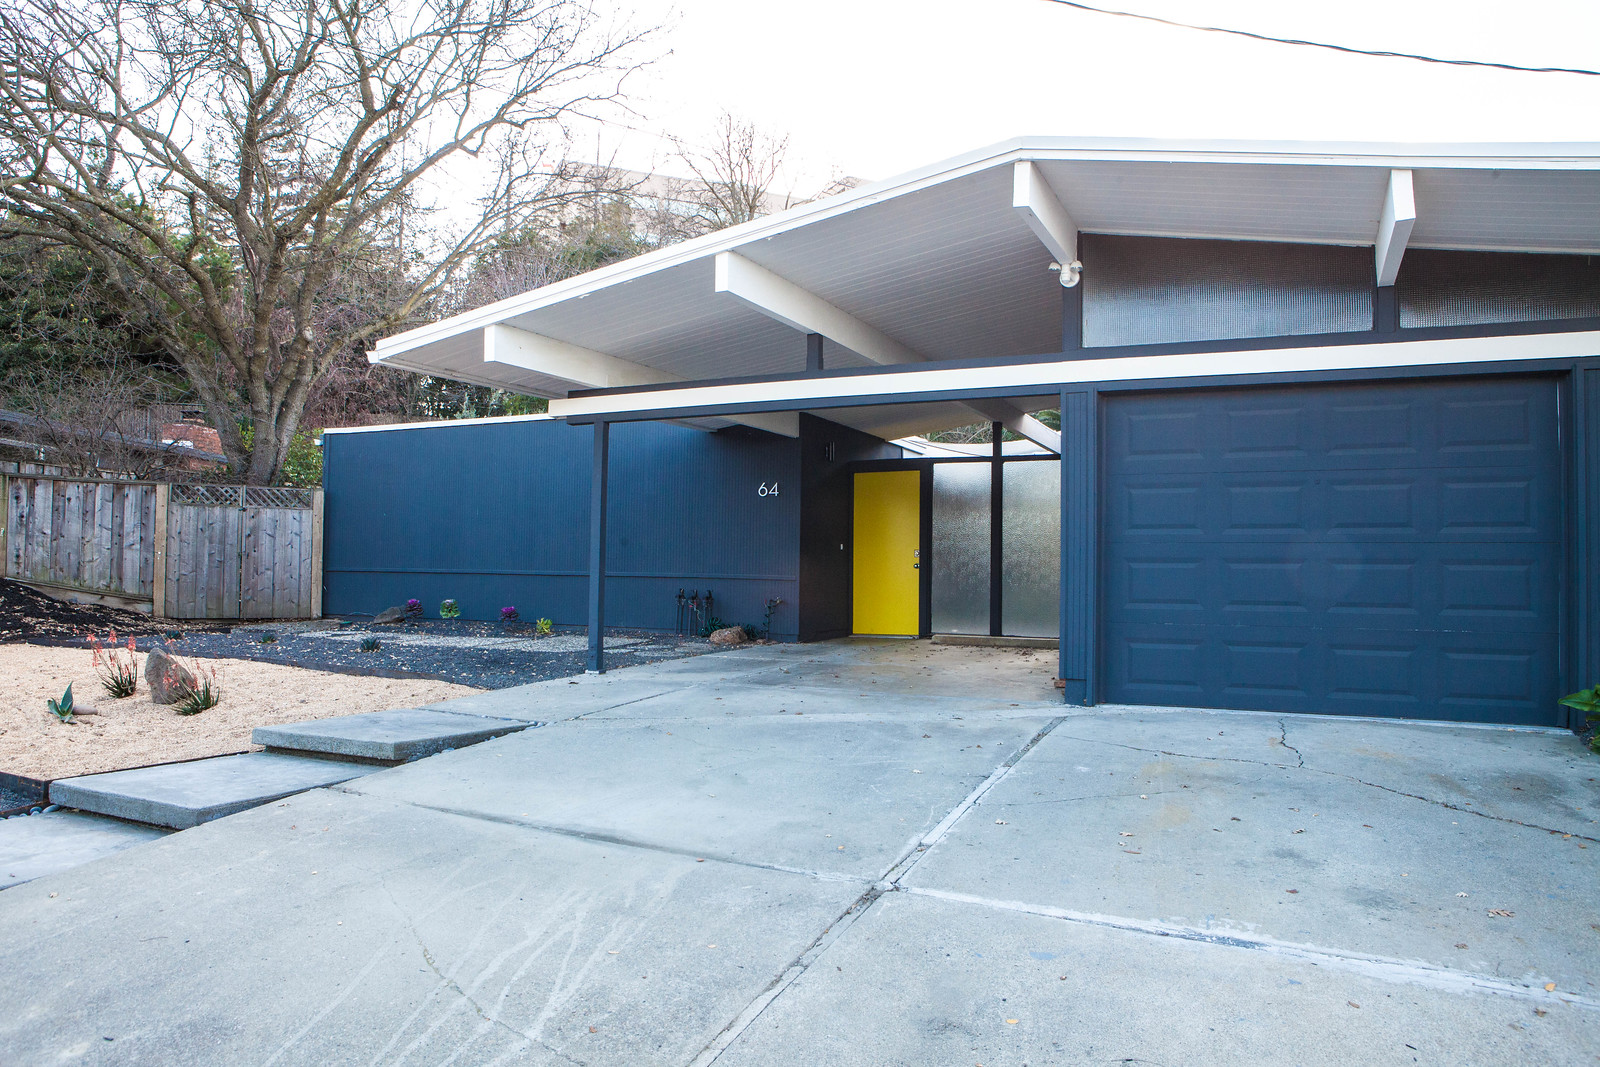 Eichler Paint Colors Eichler Stains Mid Century Modern Home Paint Tips Mid Century Modern Interior Designer Portfolio